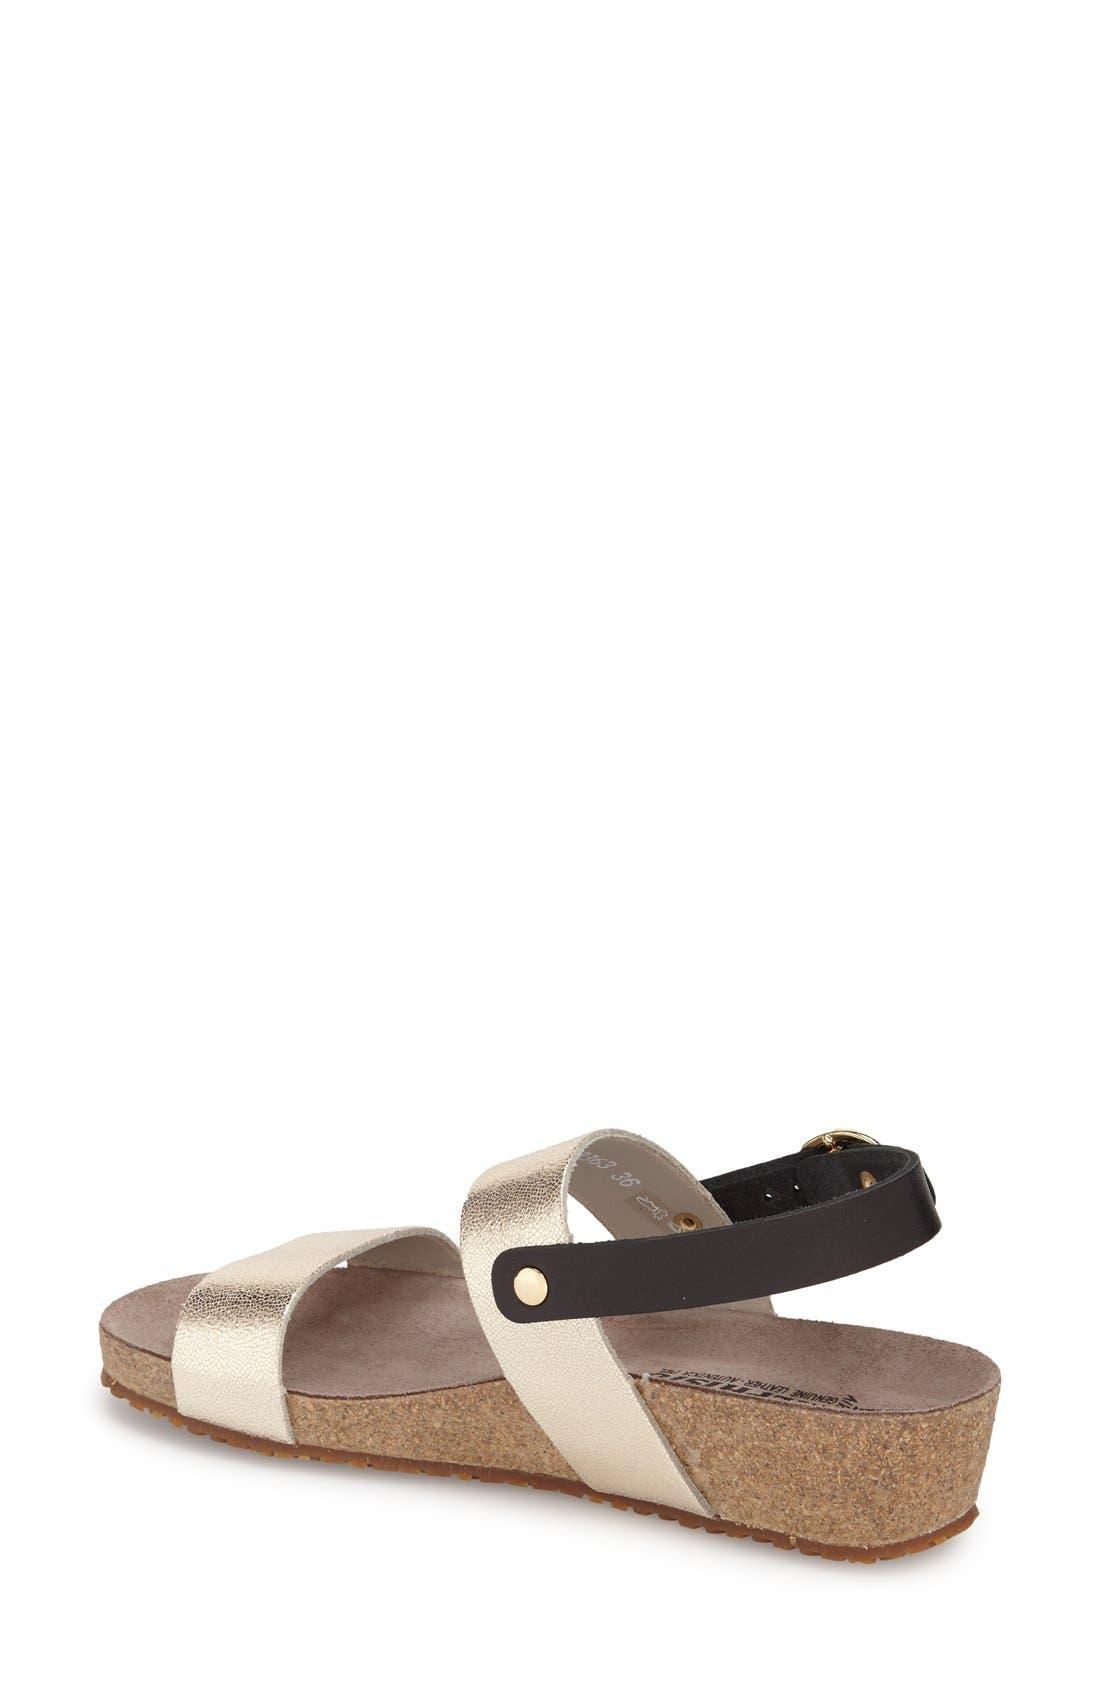 'Italia' Sandal,                             Alternate thumbnail 2, color,                             Platinum Leather